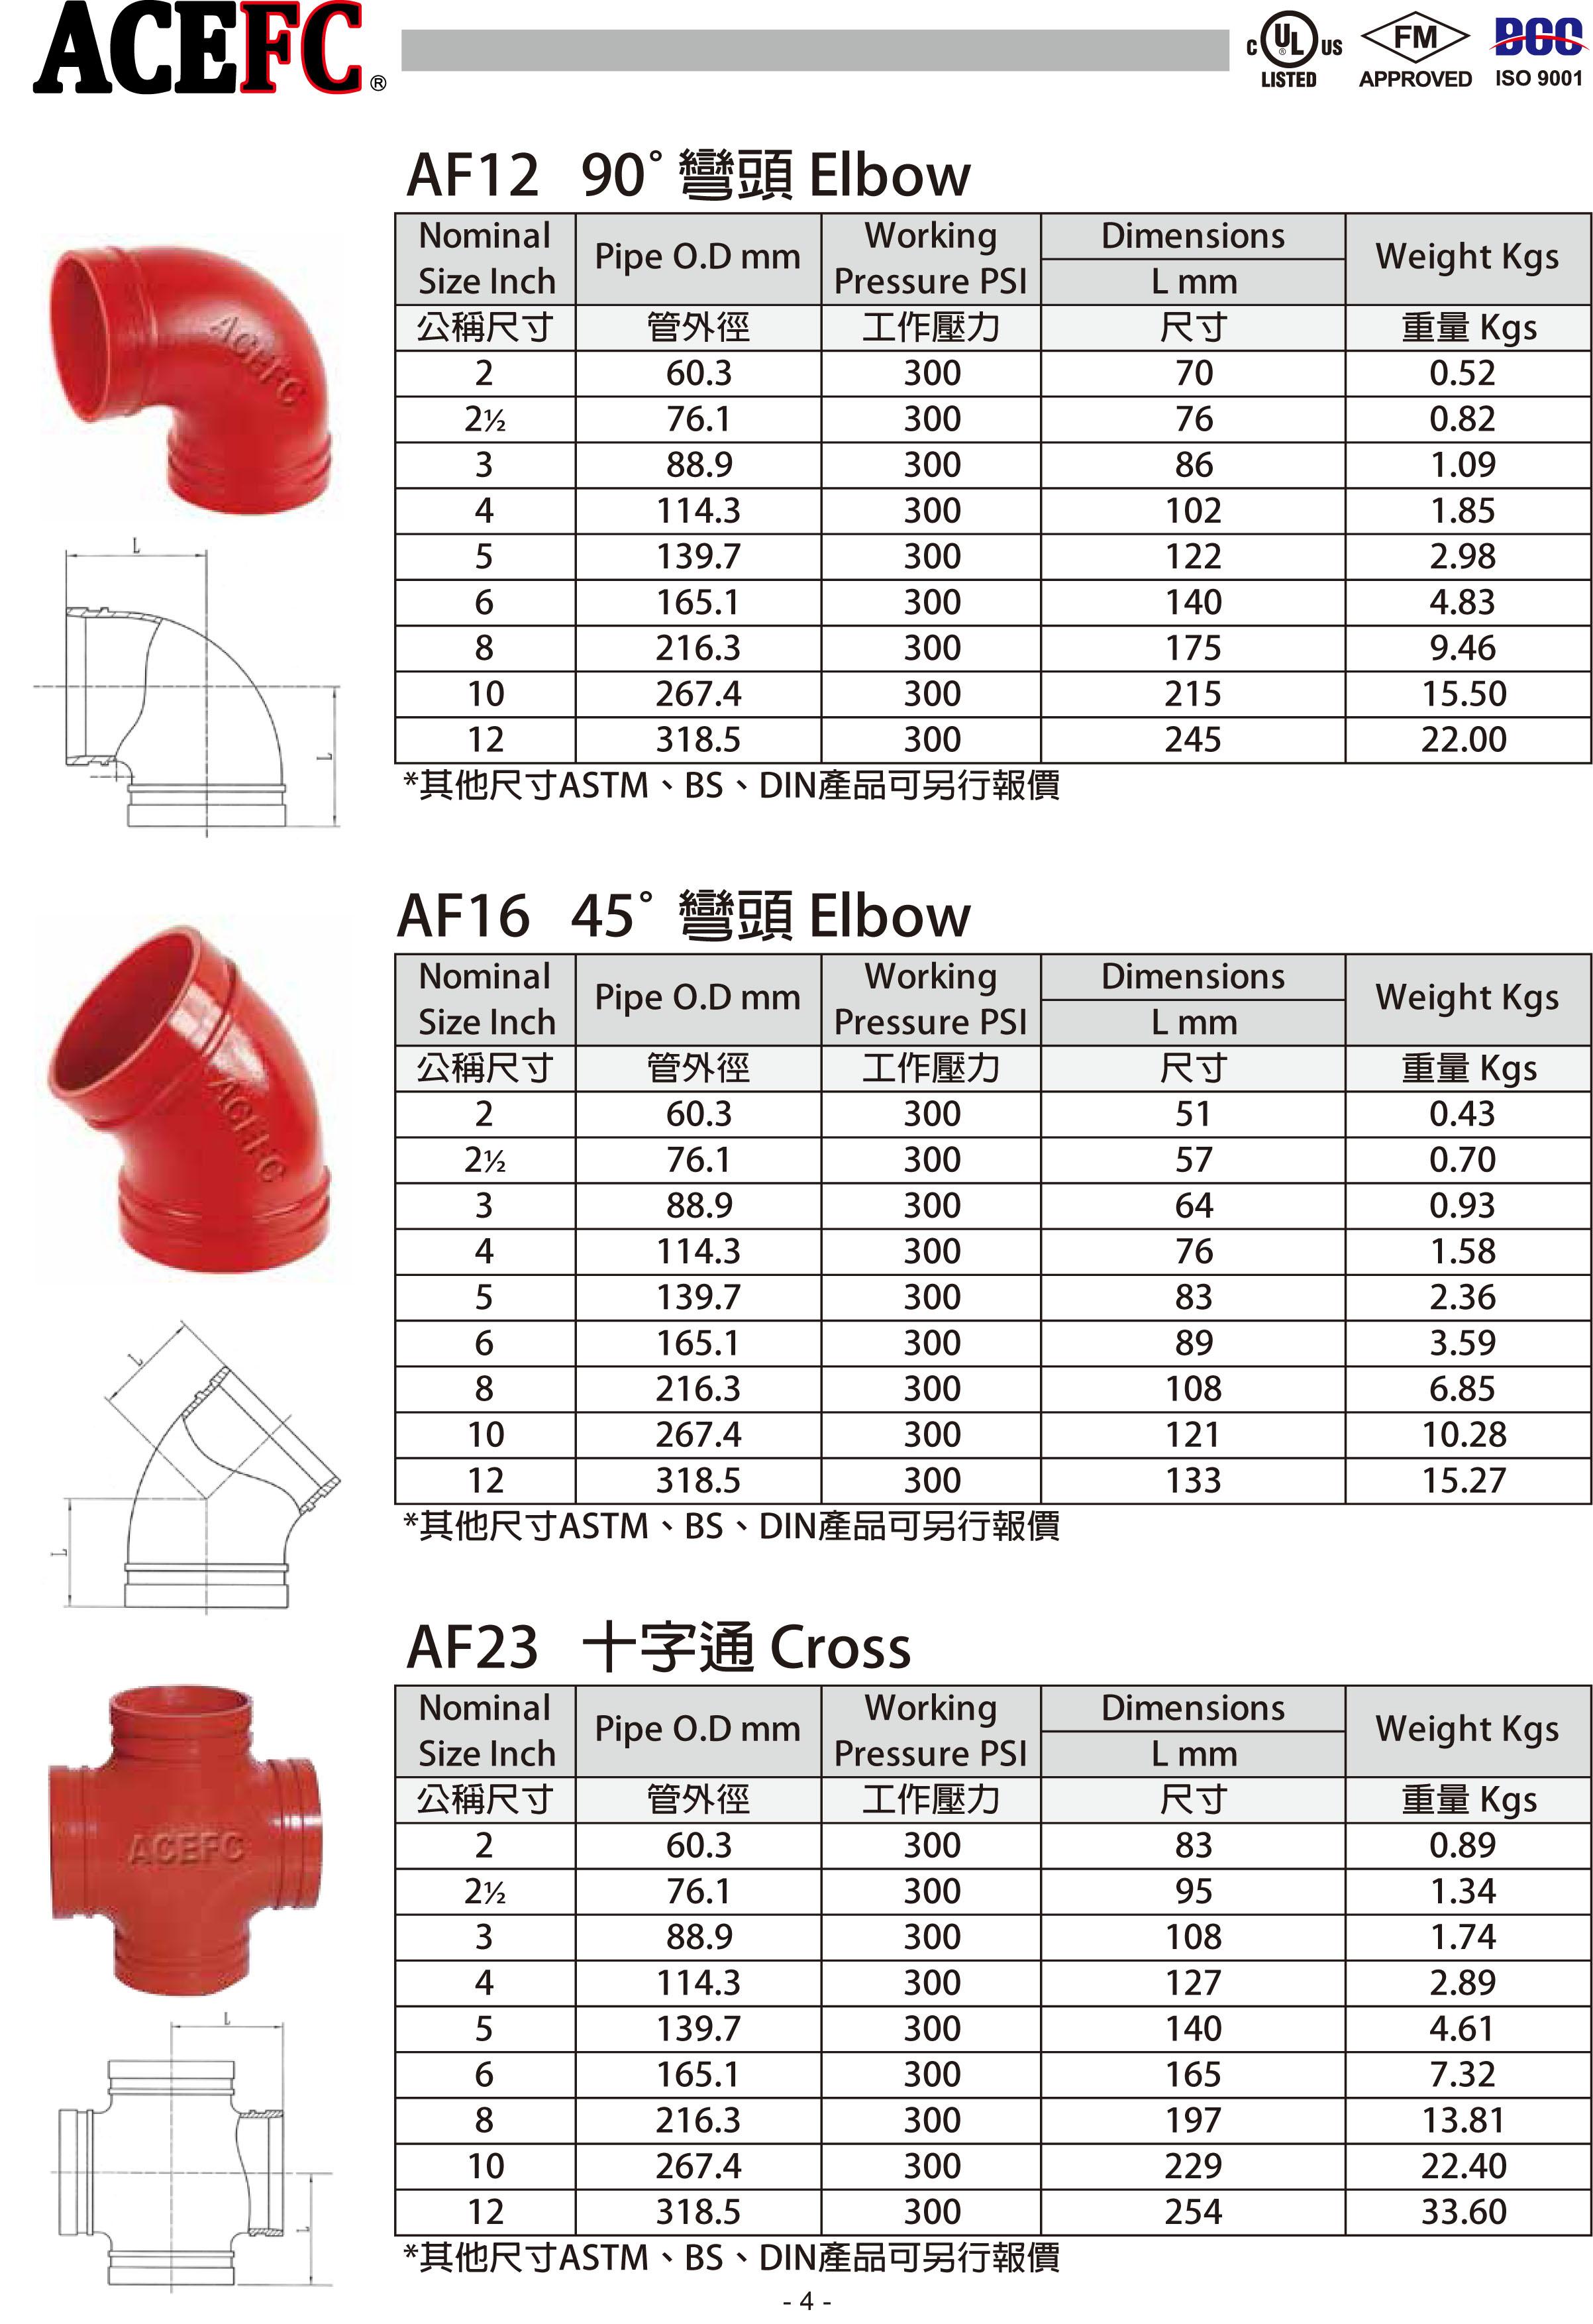 ACEFC王牌溝槽式機械接頭-高極管件-7.jpg